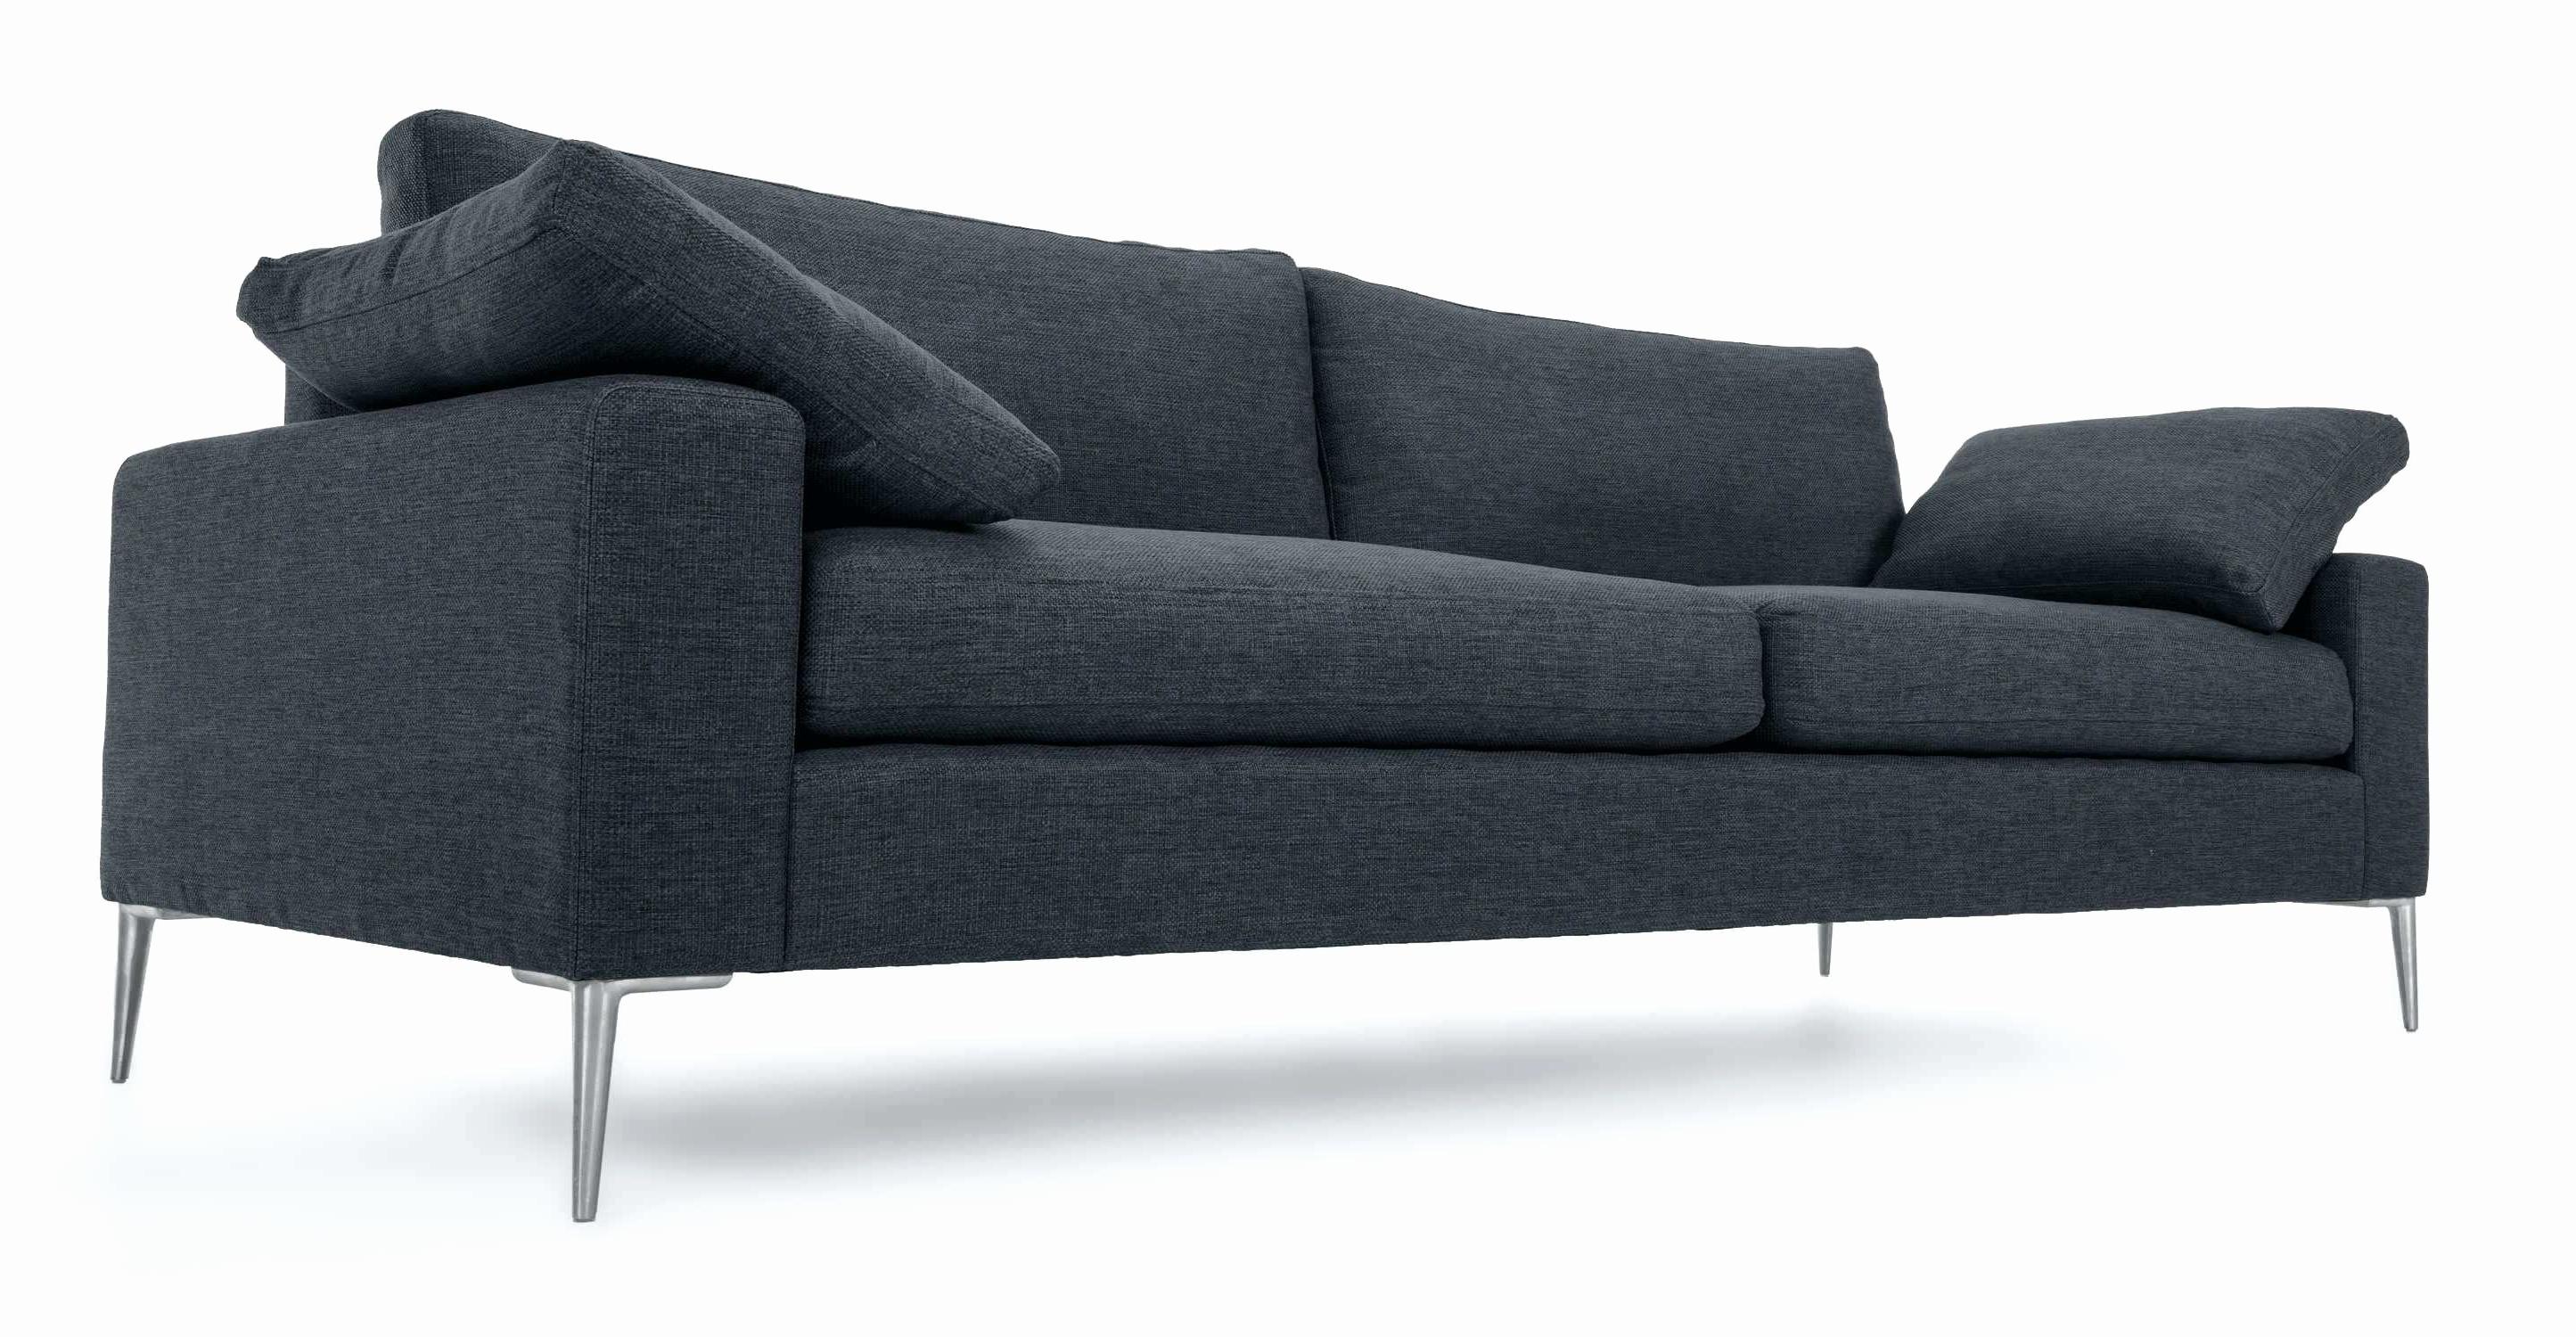 Ikea sofas Cama D0dg sofa Cama Walmart El Salvador Cama sofa sofa Cama Walmart